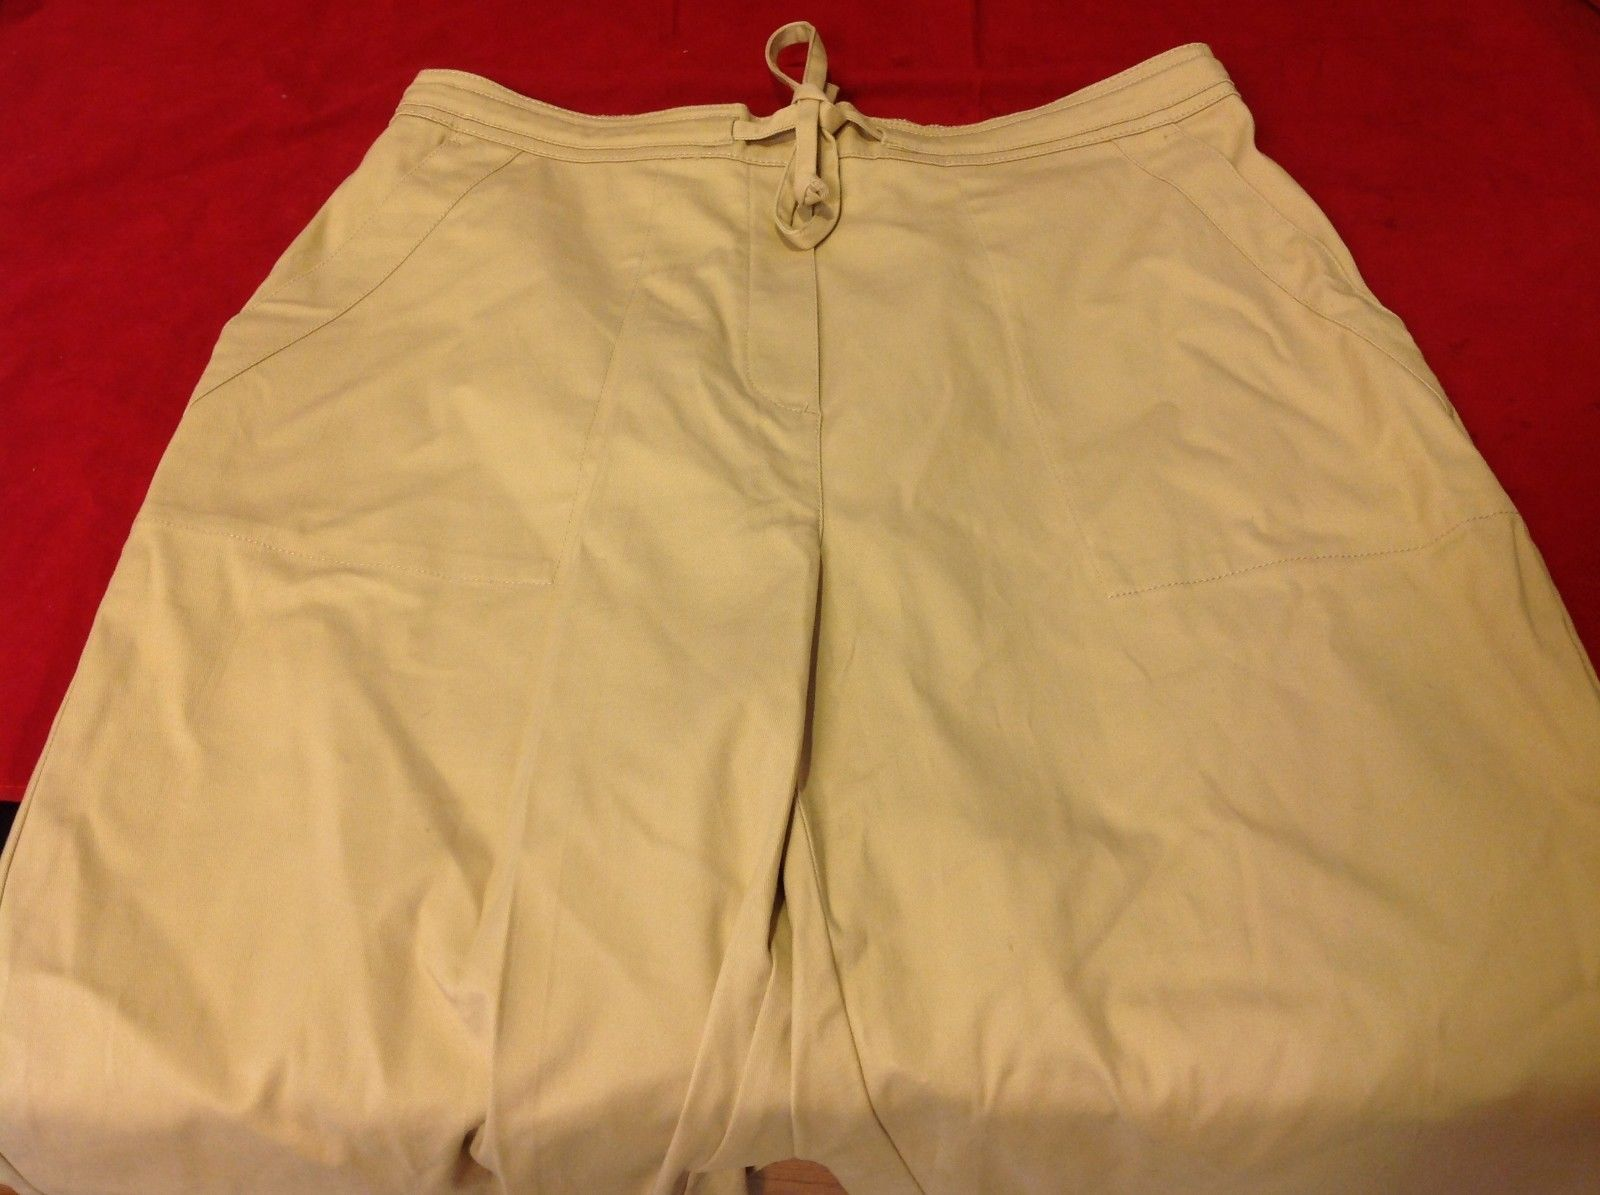 Denim & Co khaki pants women's size large